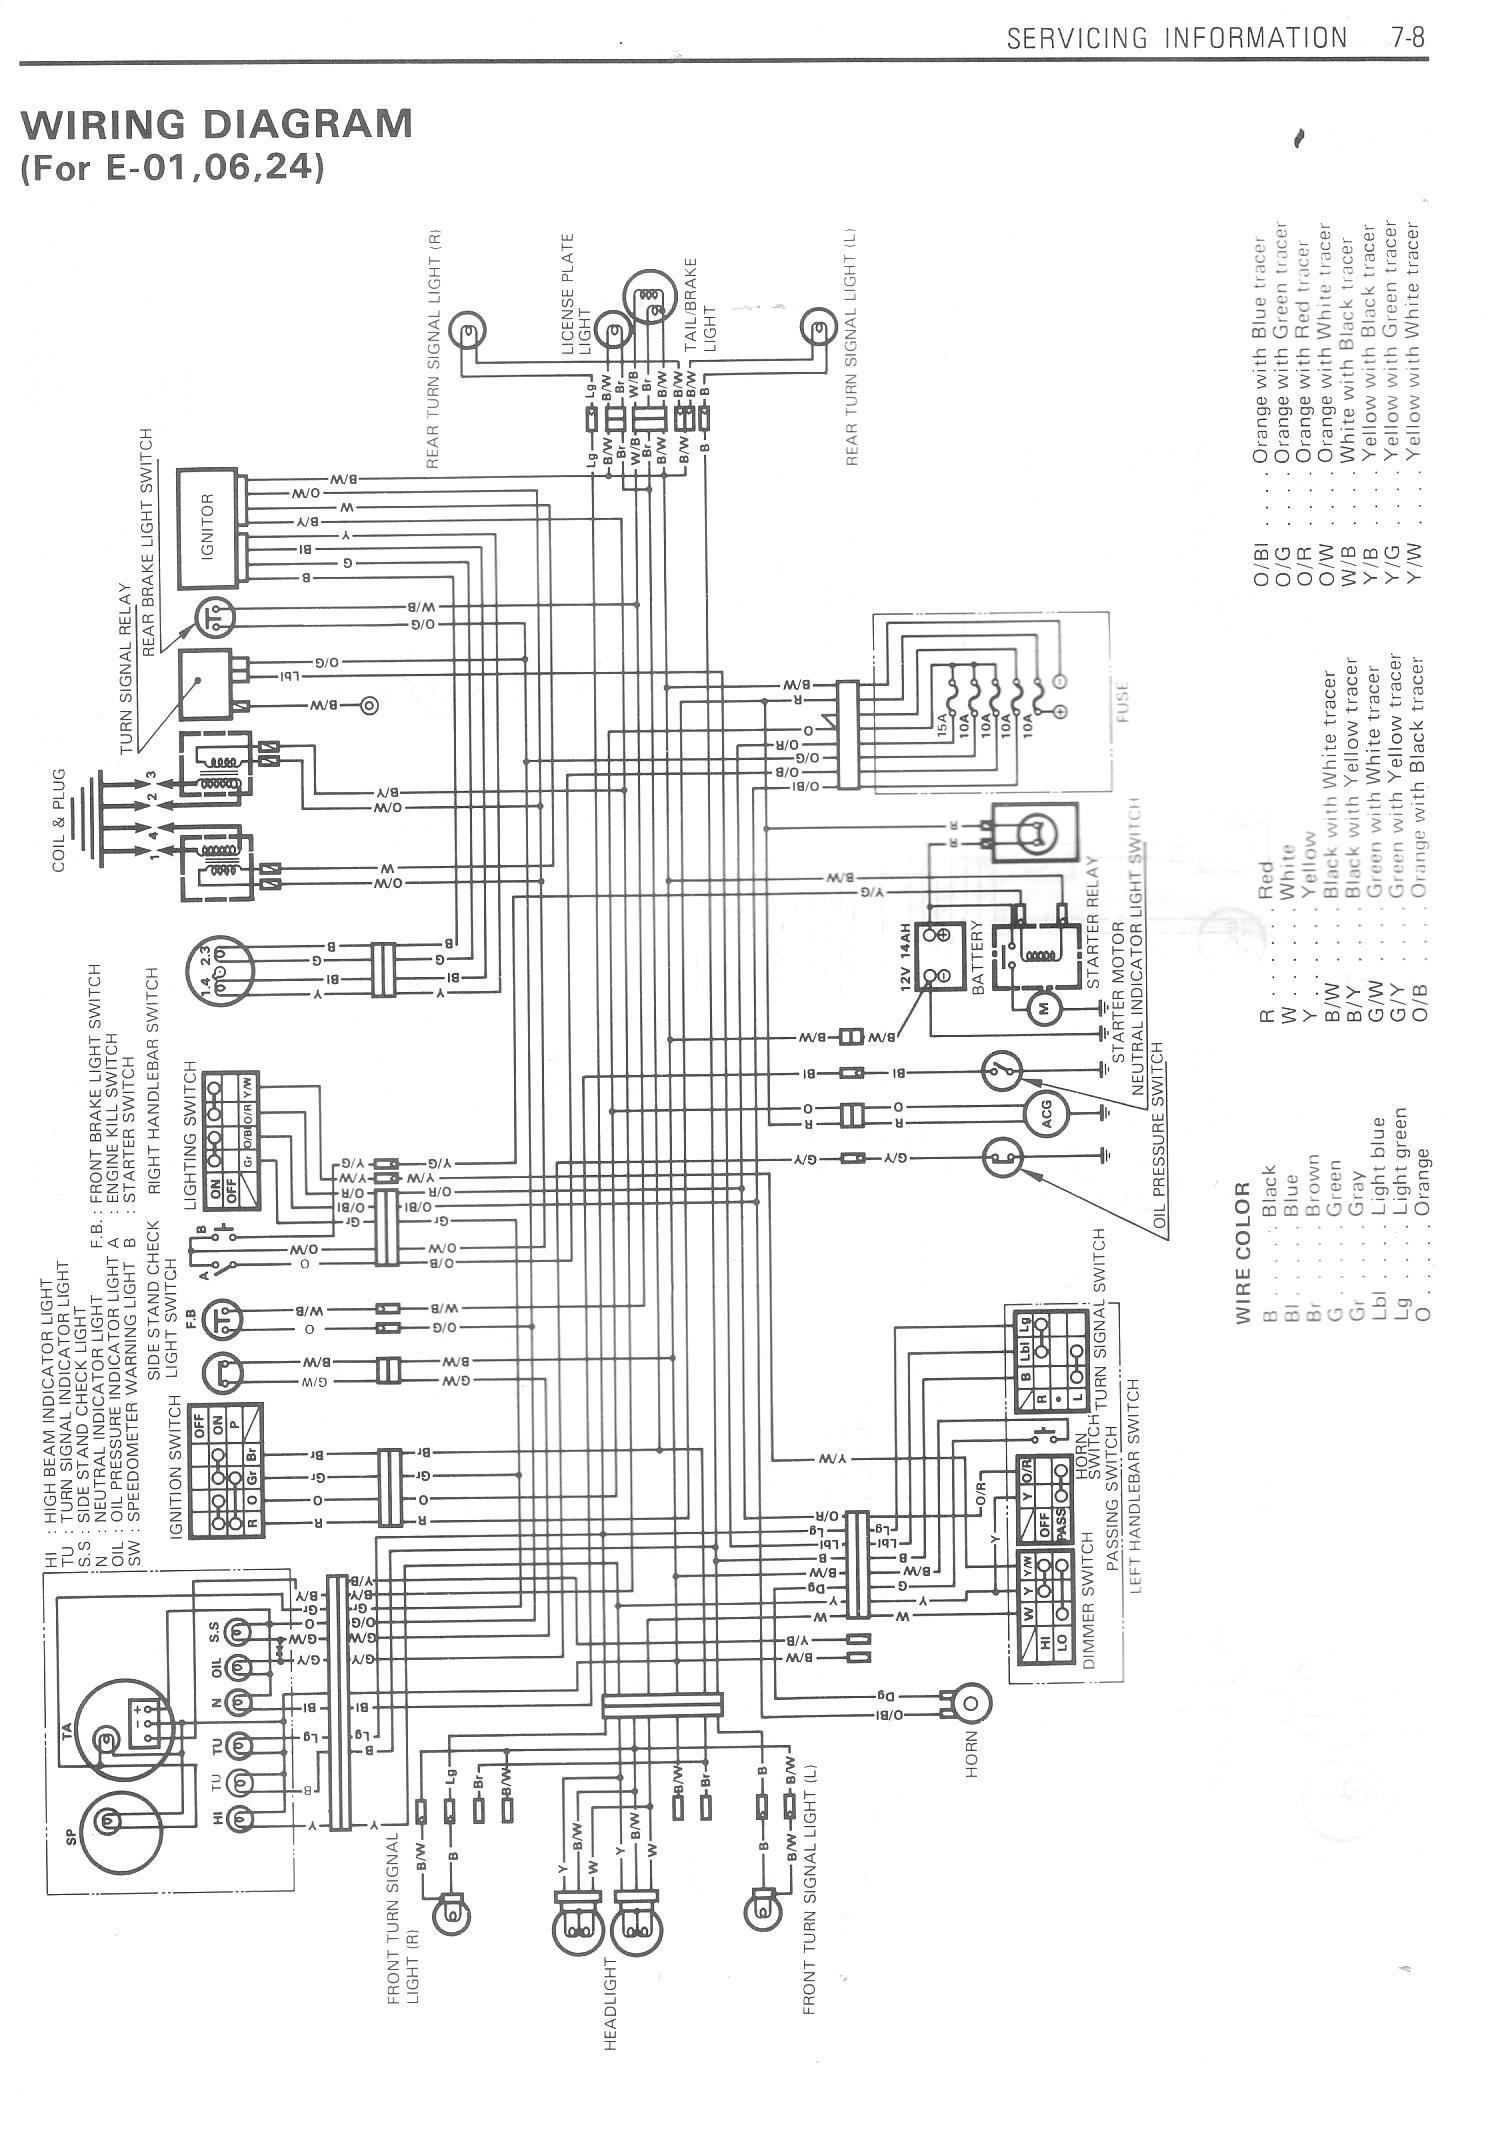 jpeg wiring1 309693 bytes ablett jp bikes gsxr carb htm